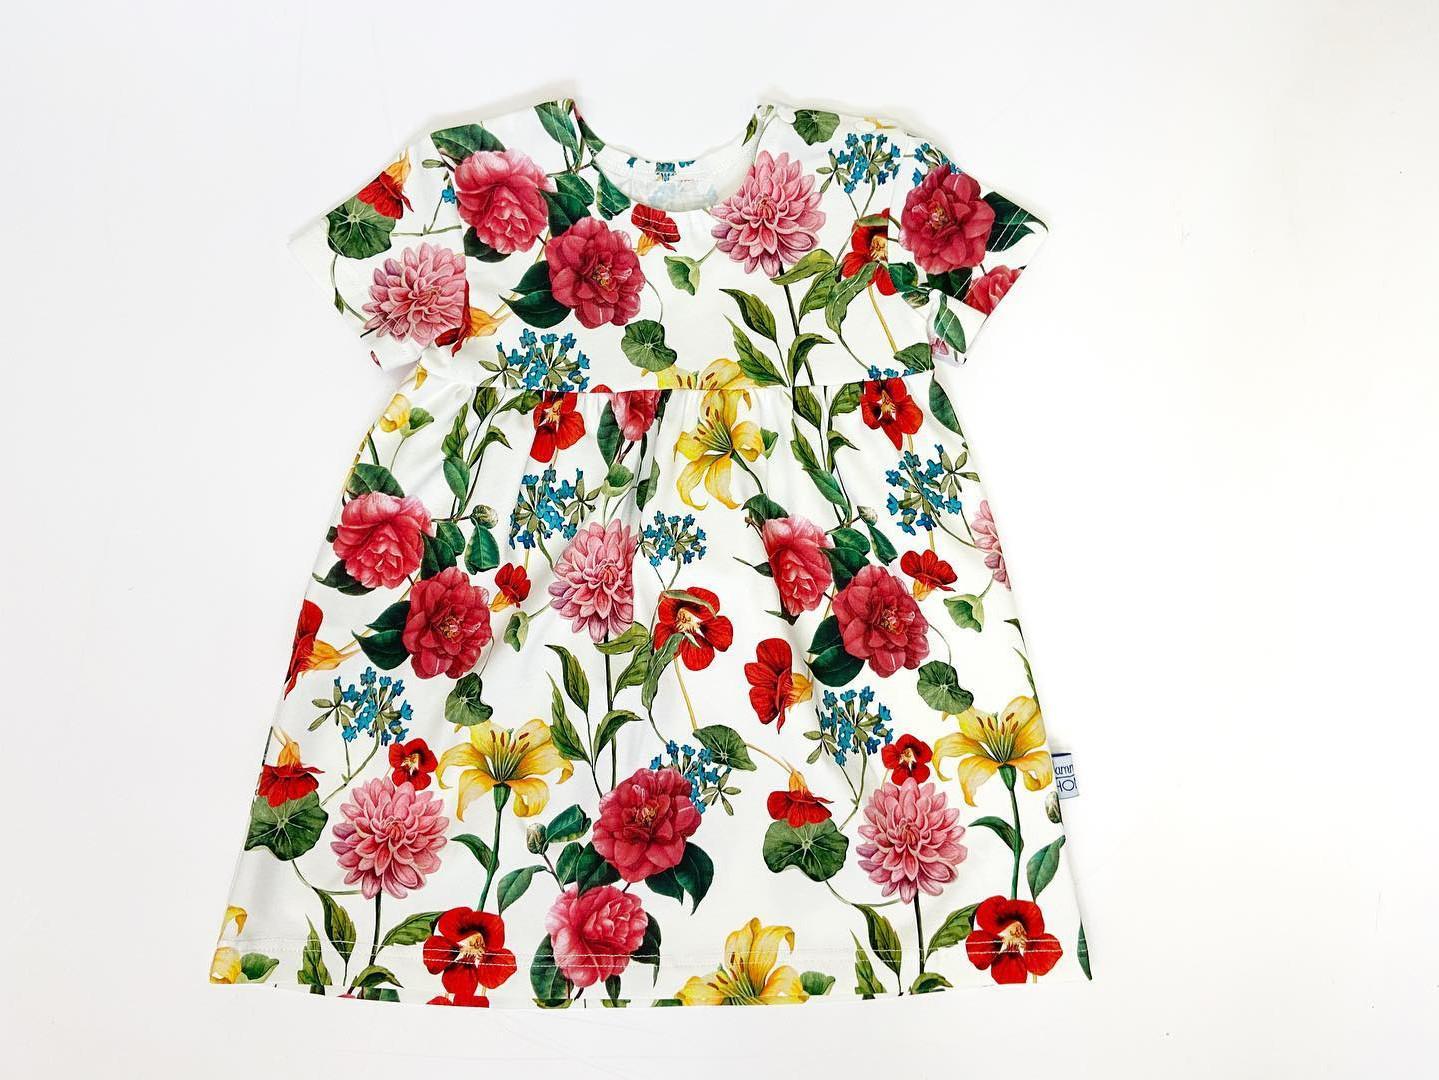 šaty4.jpg